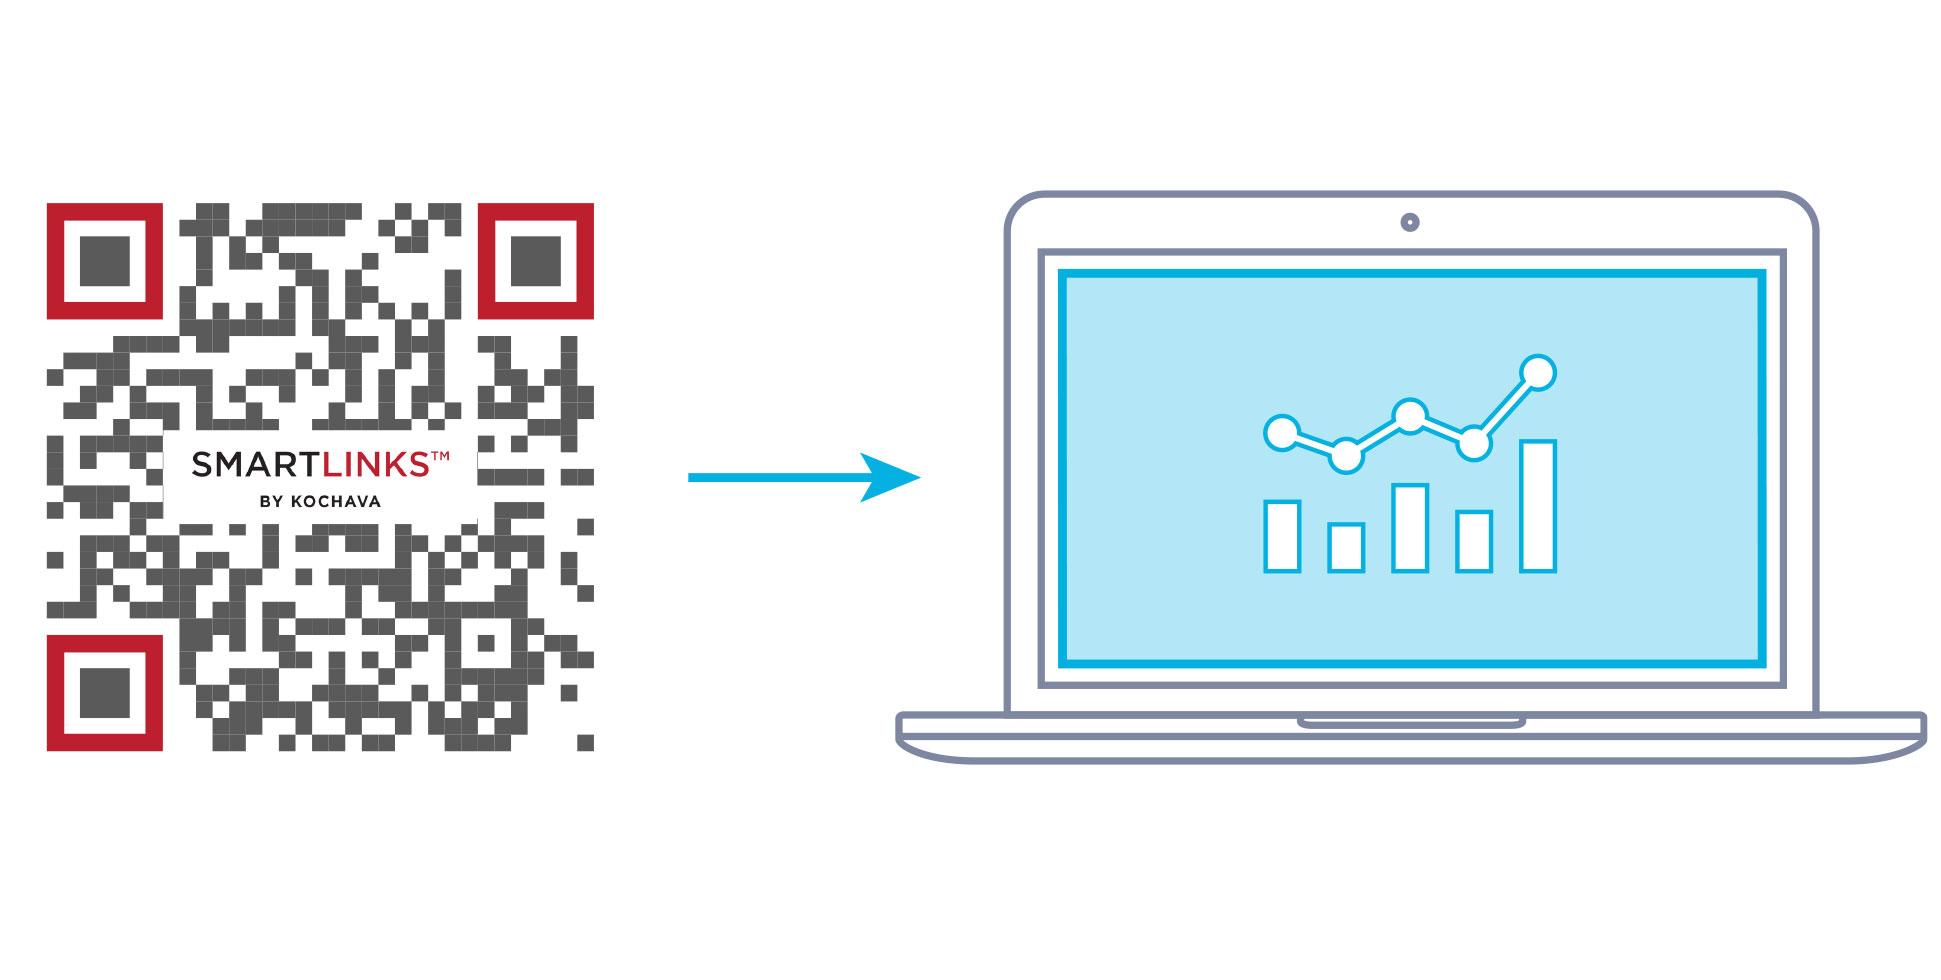 Kochava SmartLinks QR code and a laptop.